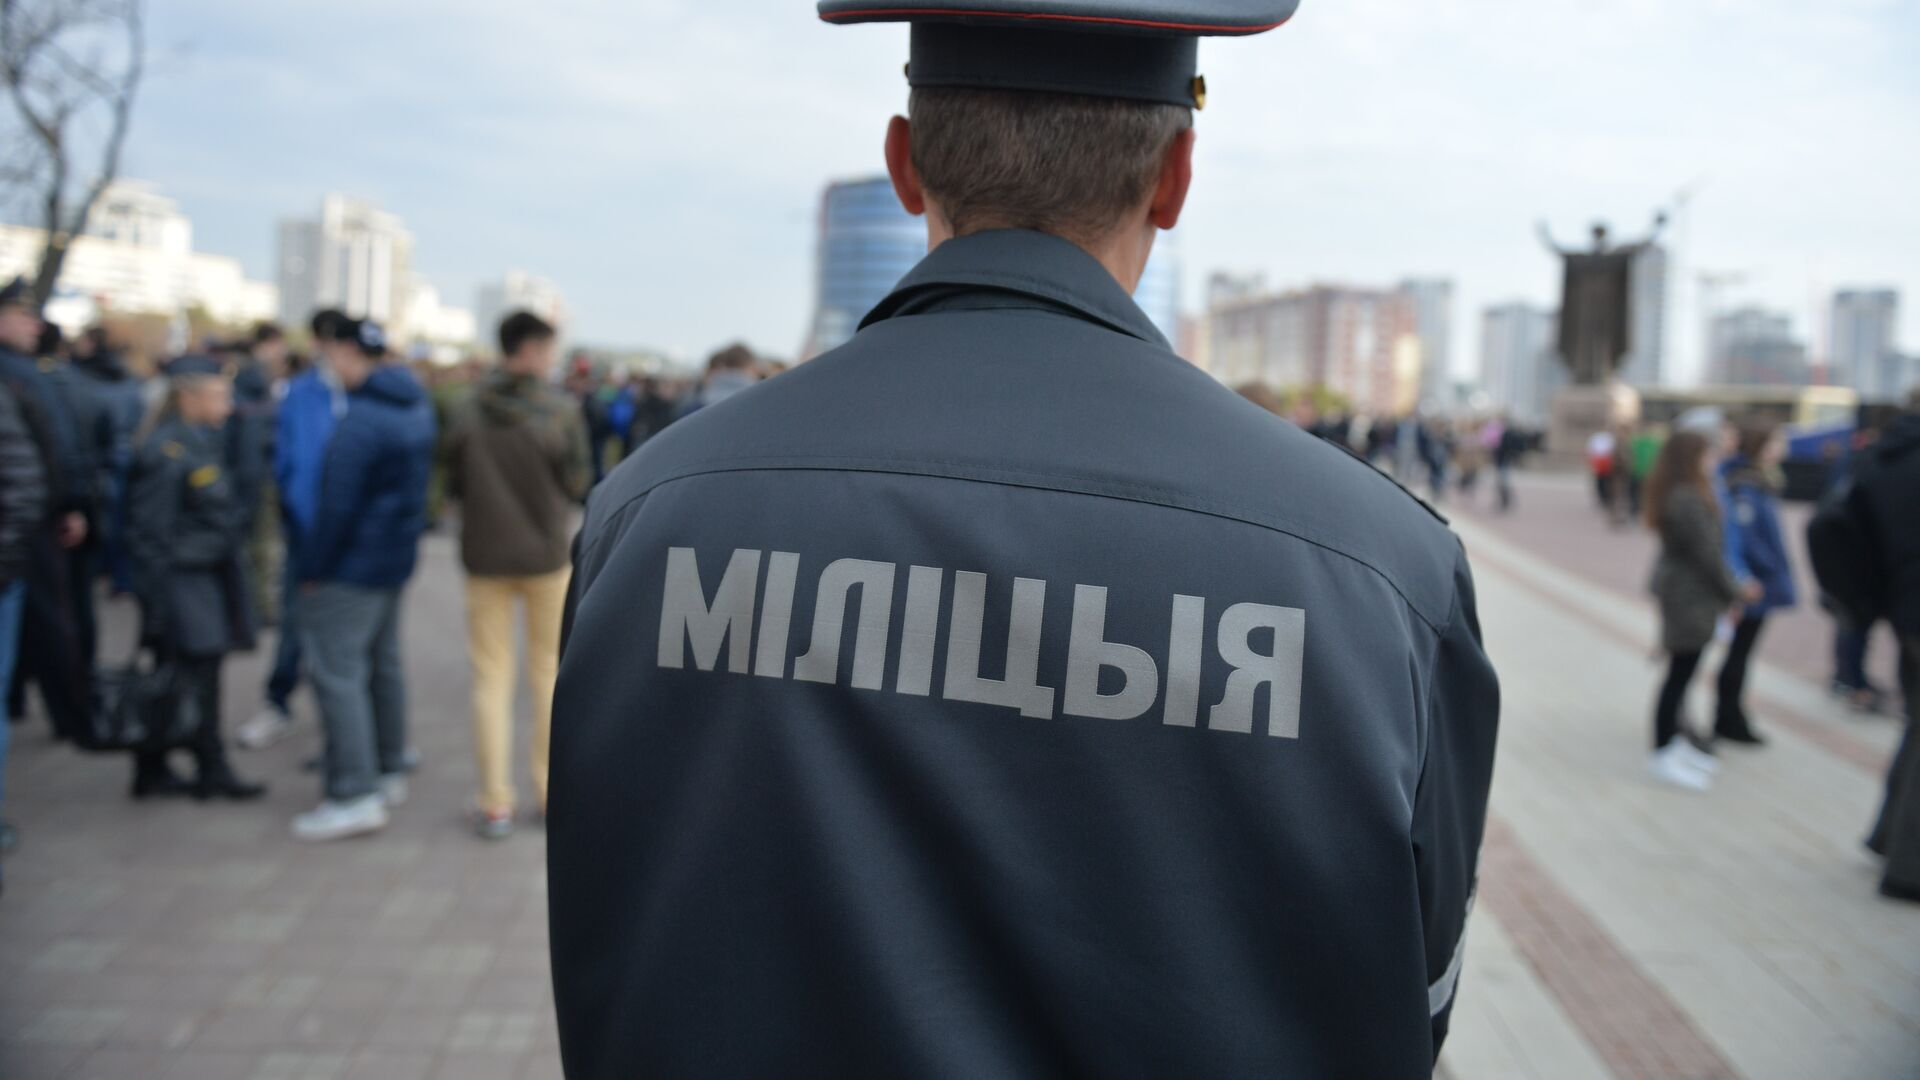 Милиционер - Sputnik Беларусь, 1920, 05.05.2021